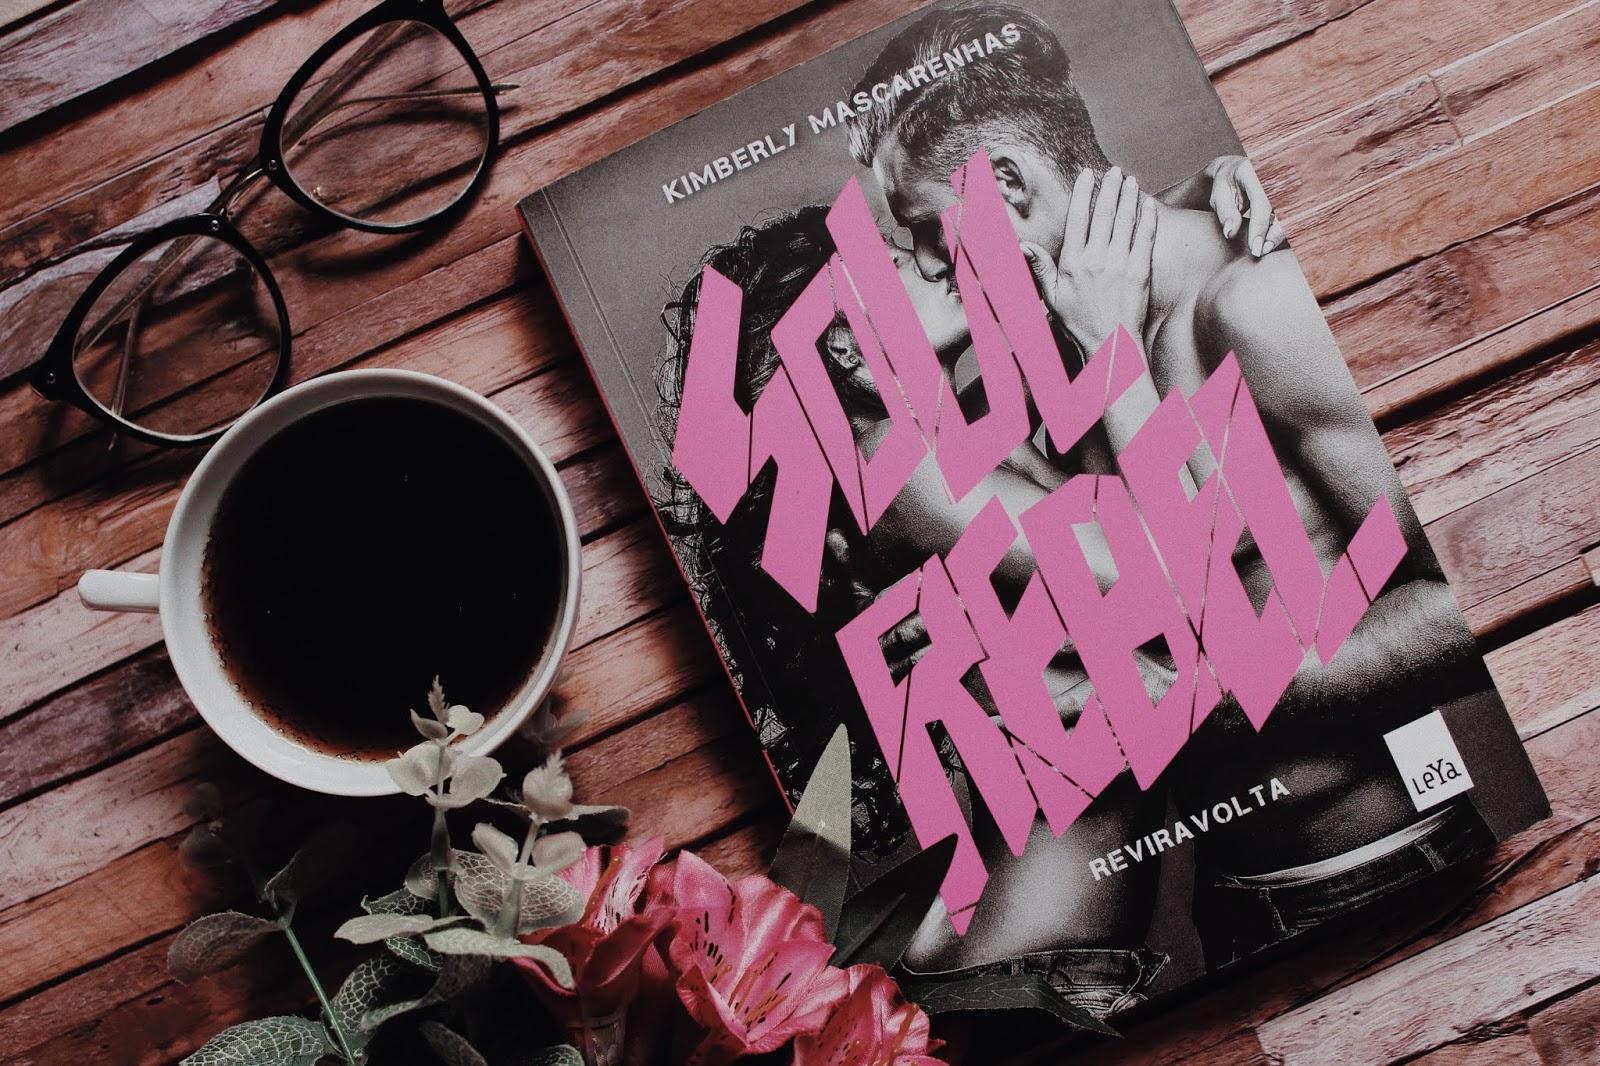 Abandonei sem dó: Reviravolta (série Soul Rebel) - Kimberly Mascarenhas